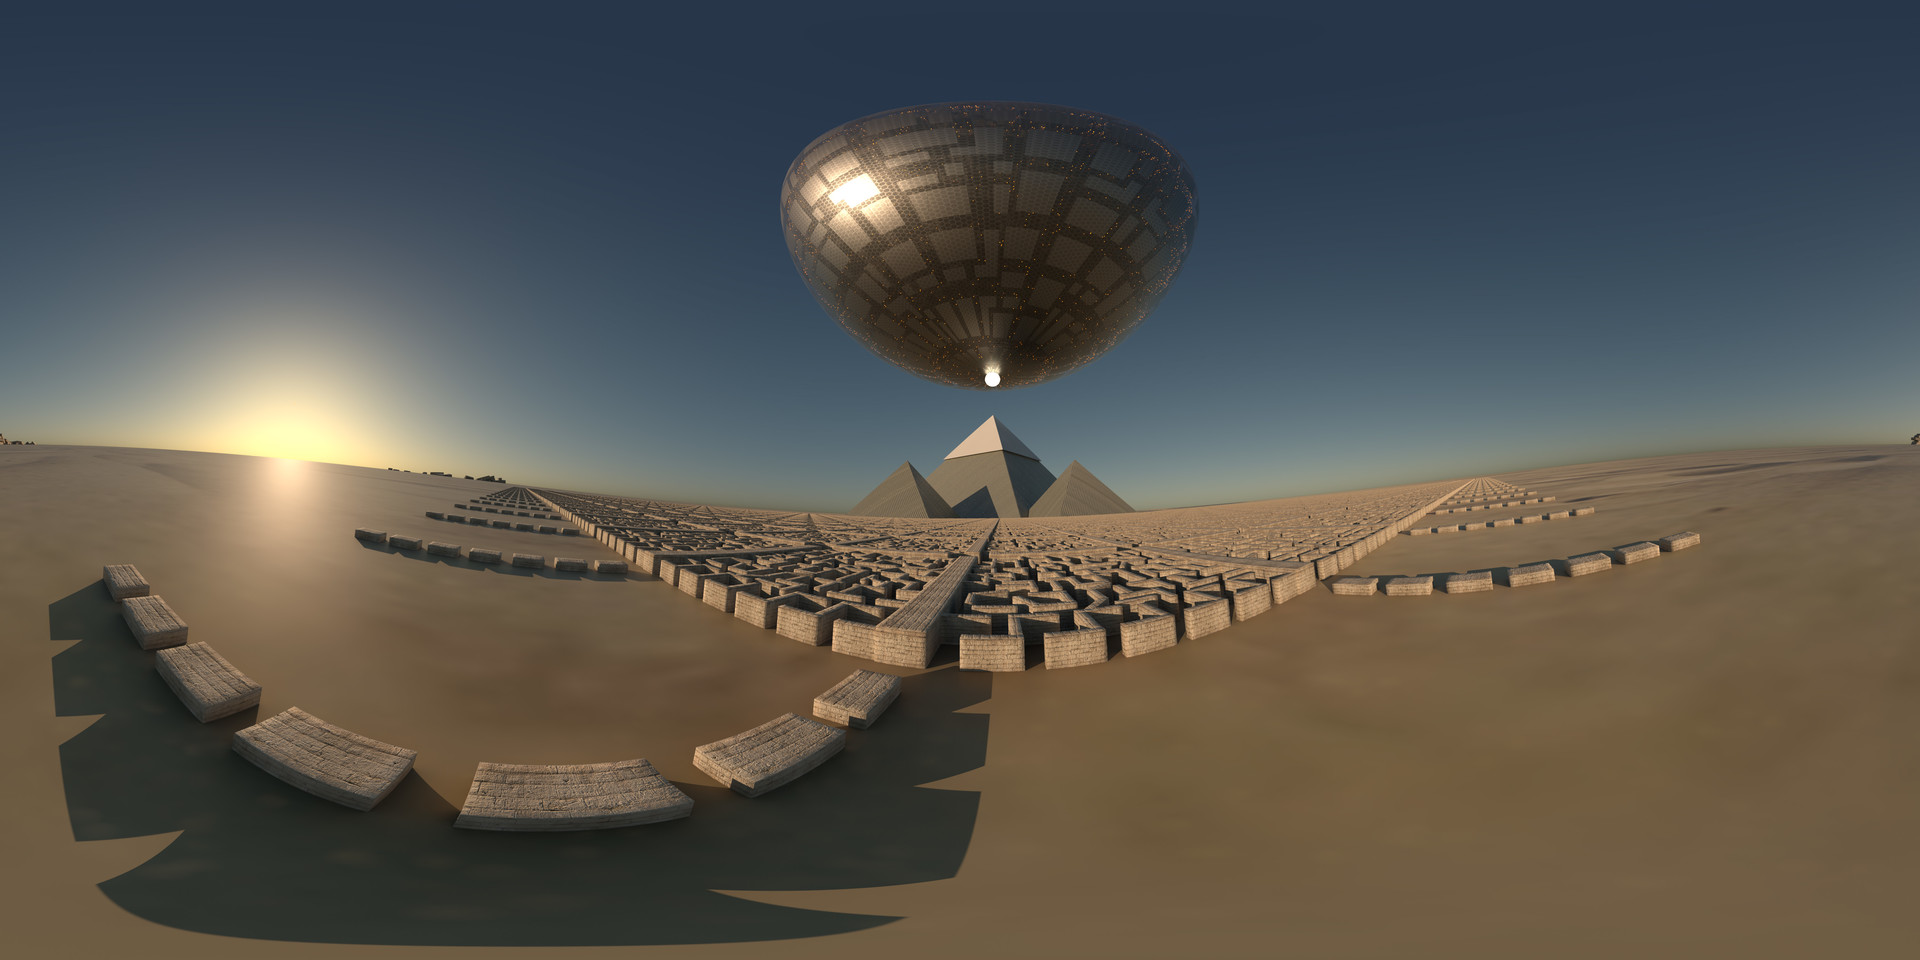 Jeff bartzis as01 env planetsurface spherical 002 raw